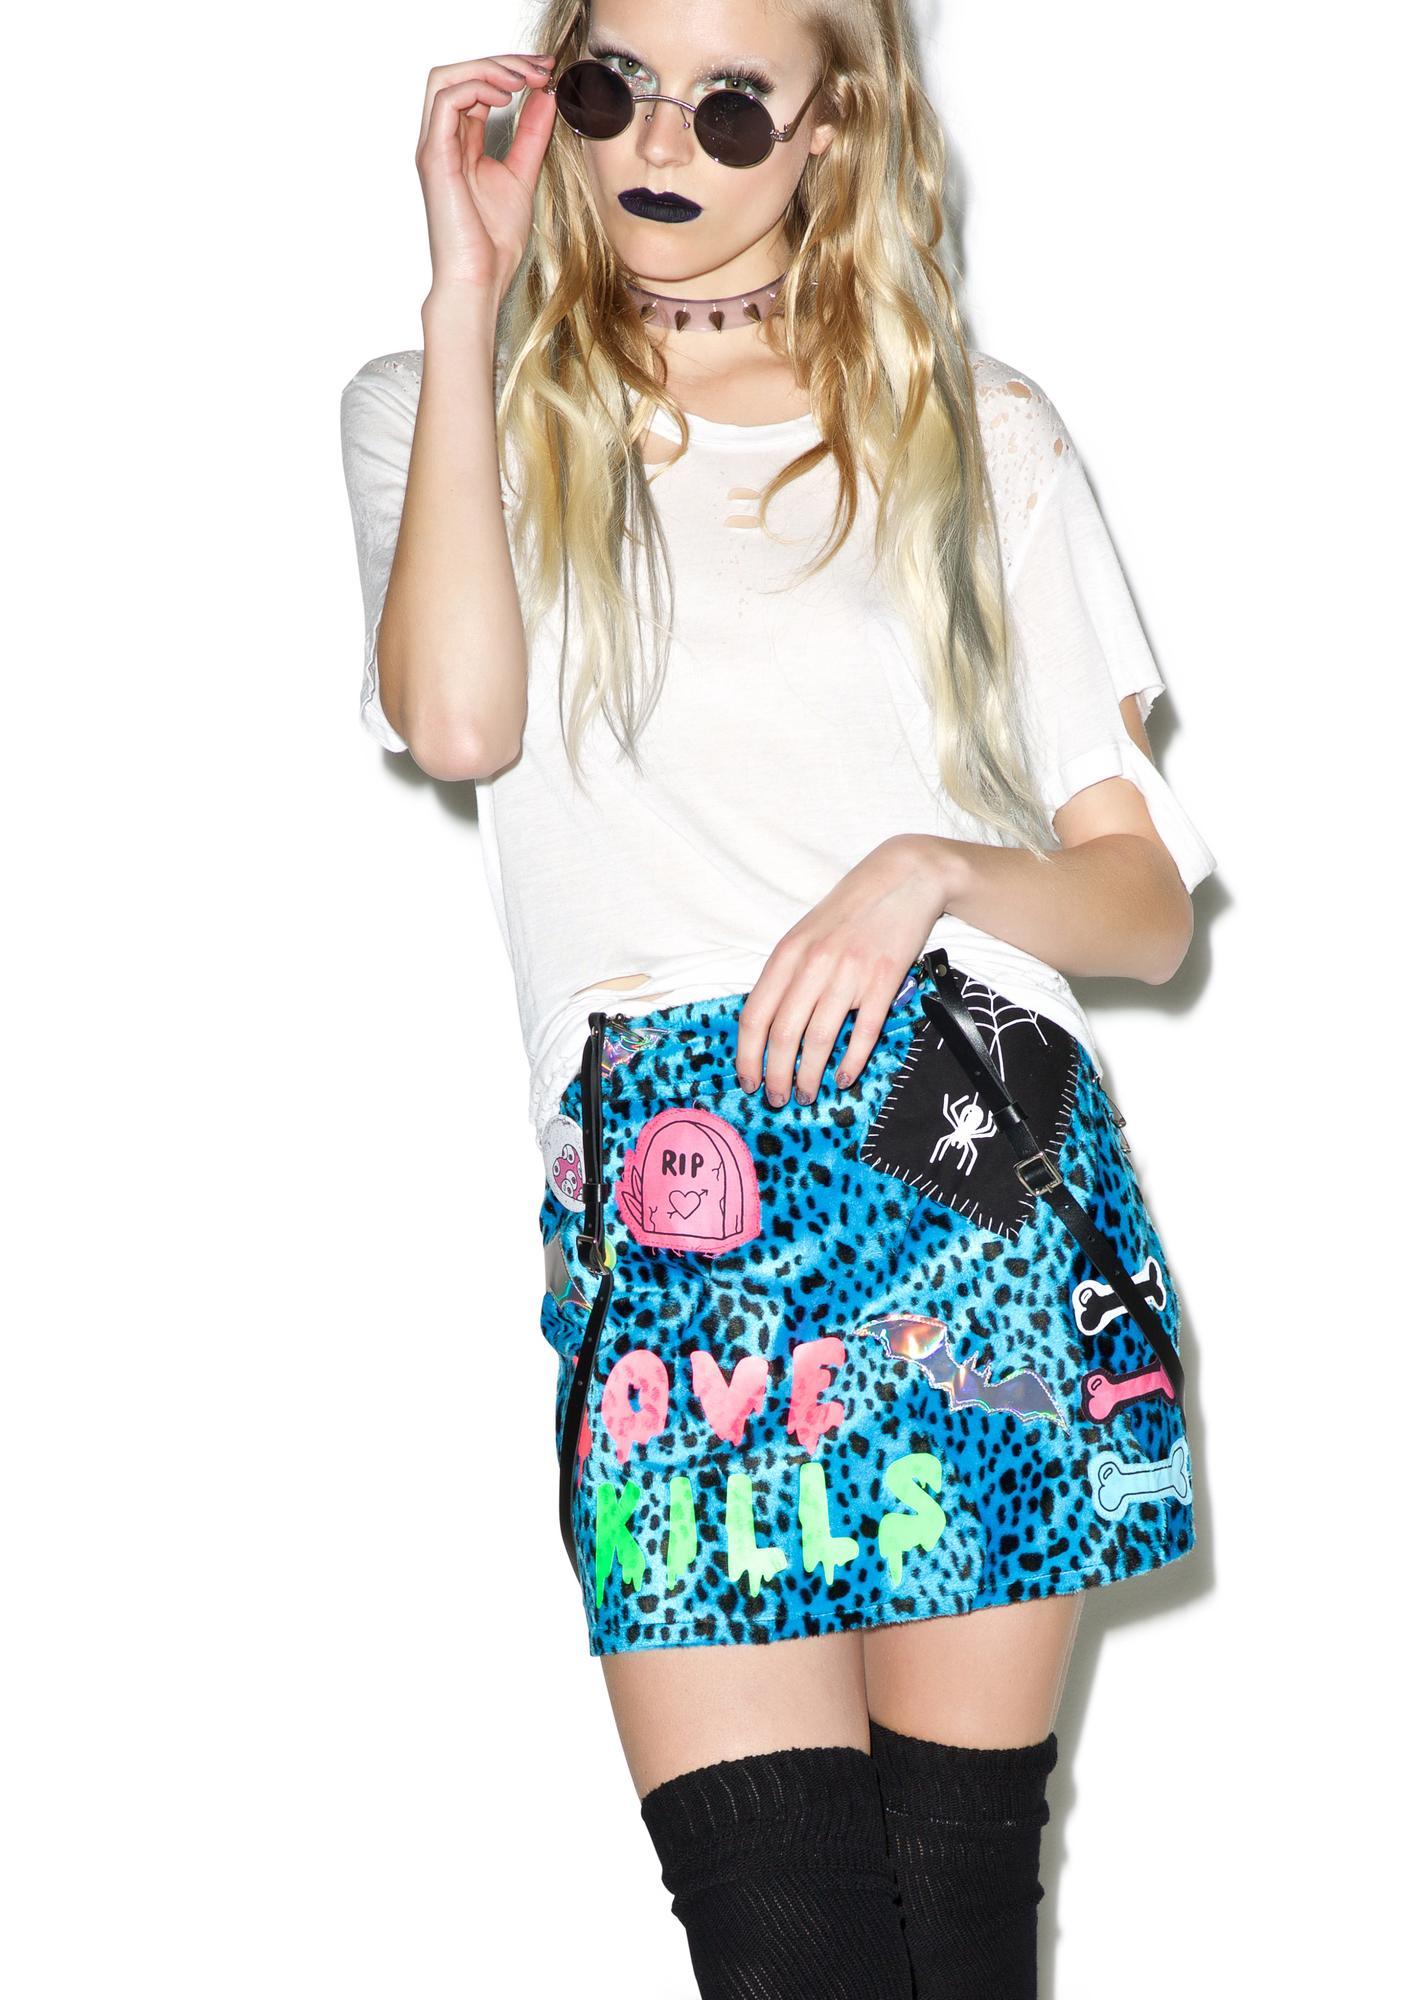 Indyanna Suzi High Waist Blue Leopard Mini Skirt